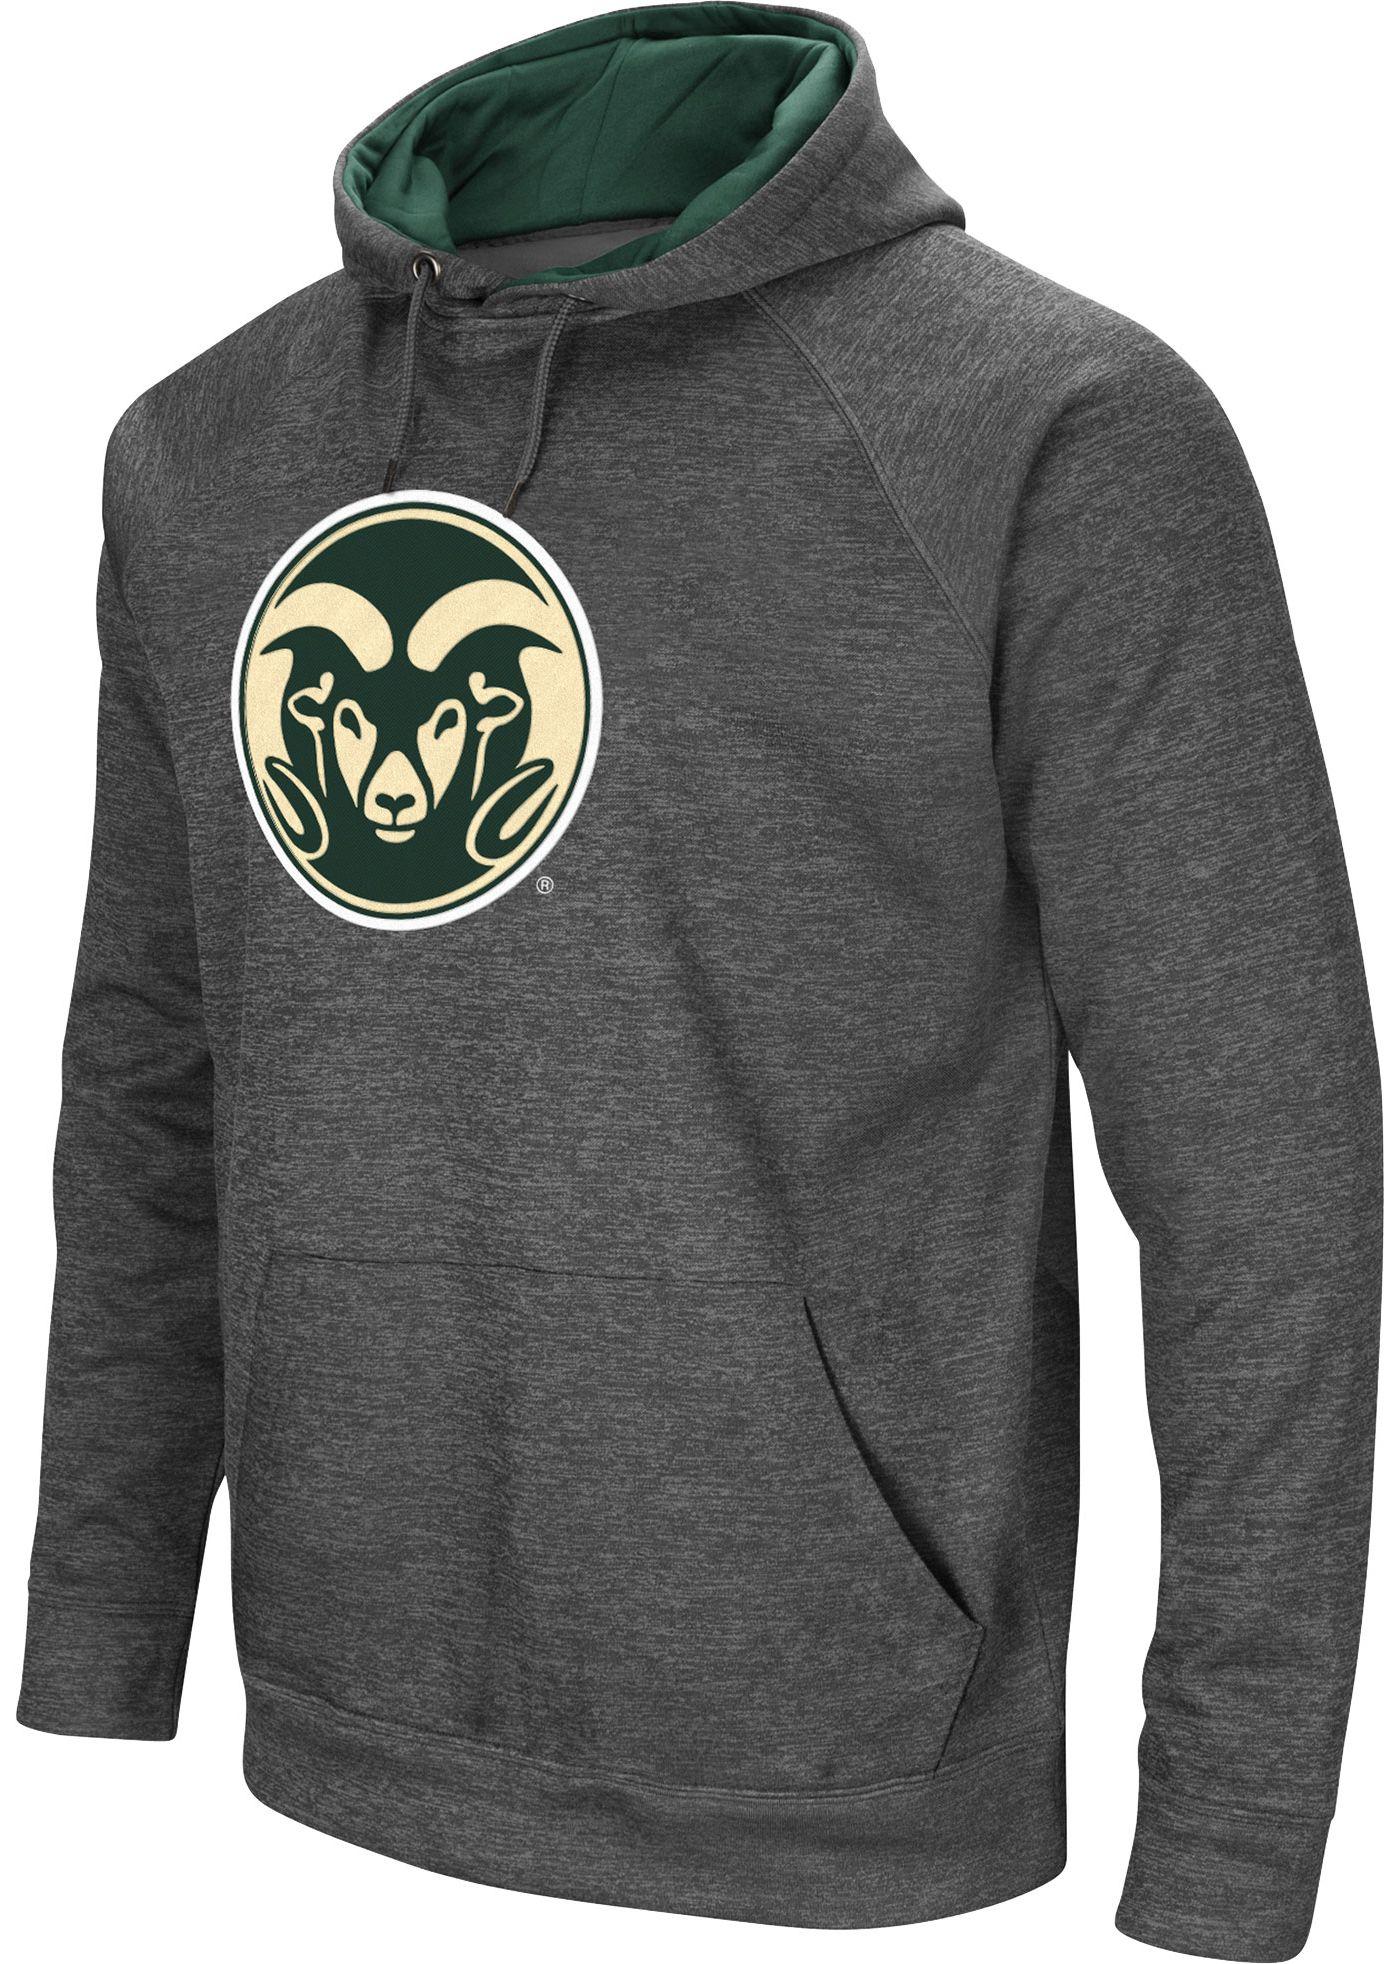 Colosseum Men's Colorado State Rams Grey Fleece Pullover Hoodie